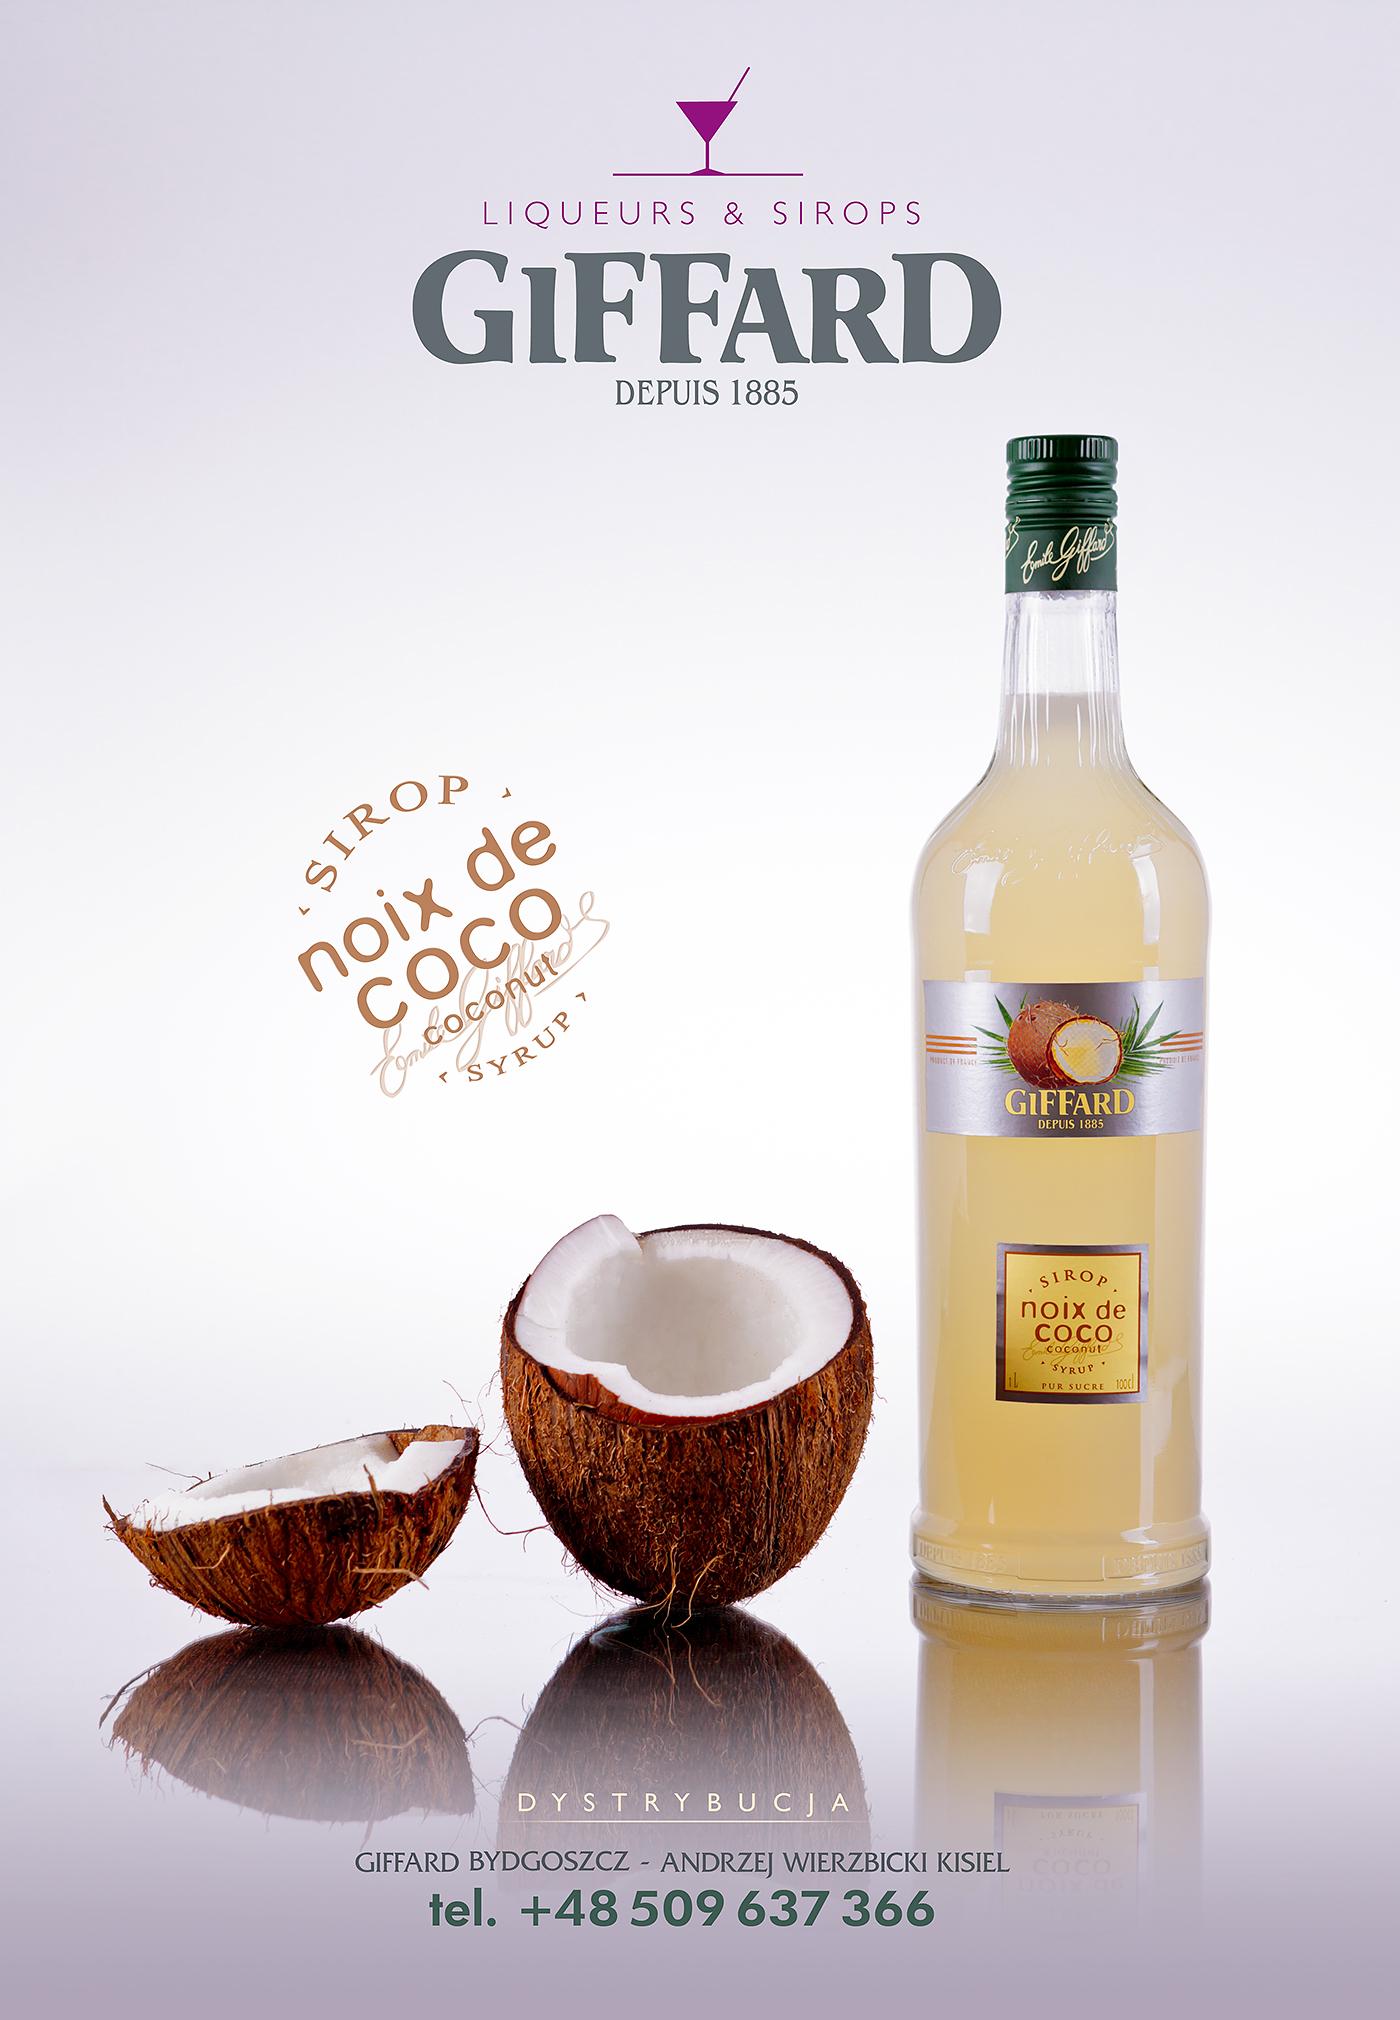 Liqueur syrup kumi studio giffard kugi watermelon pistachio peach Coconut Bourgogne photo session pics pictures photos